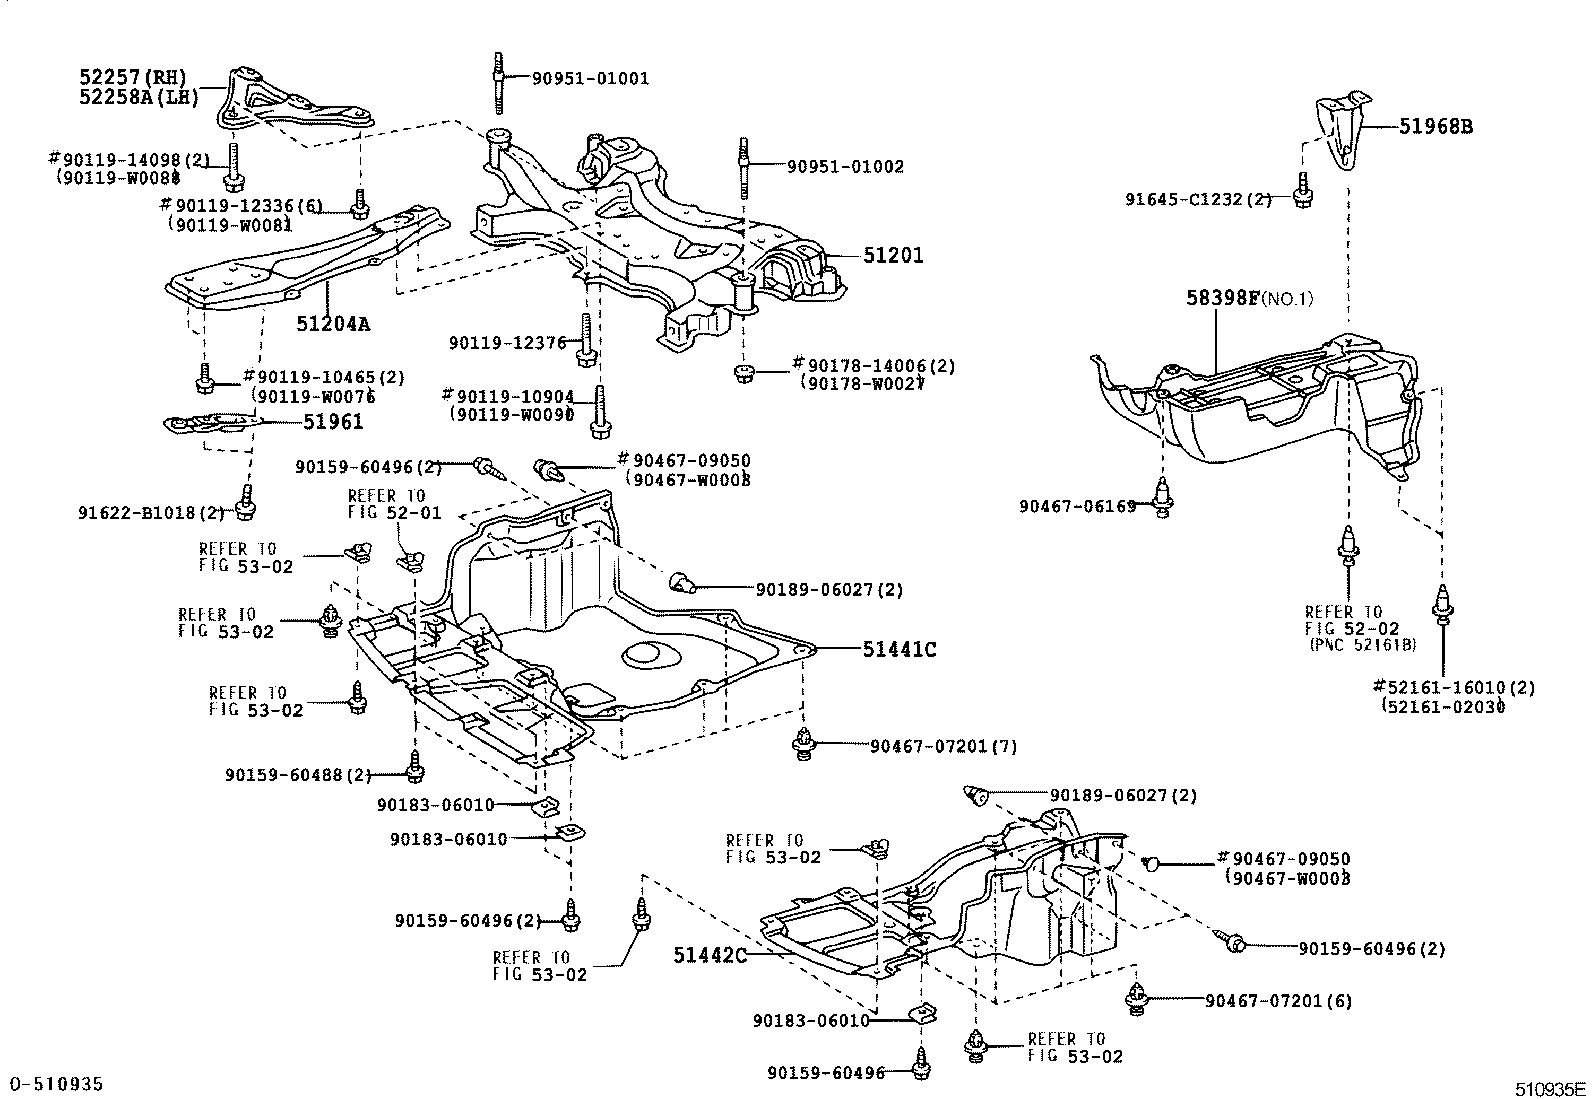 1986 Toyota Mr2 Plug Diagram Wiring Diagrams 91 Wire Loom Parts Auto 1987